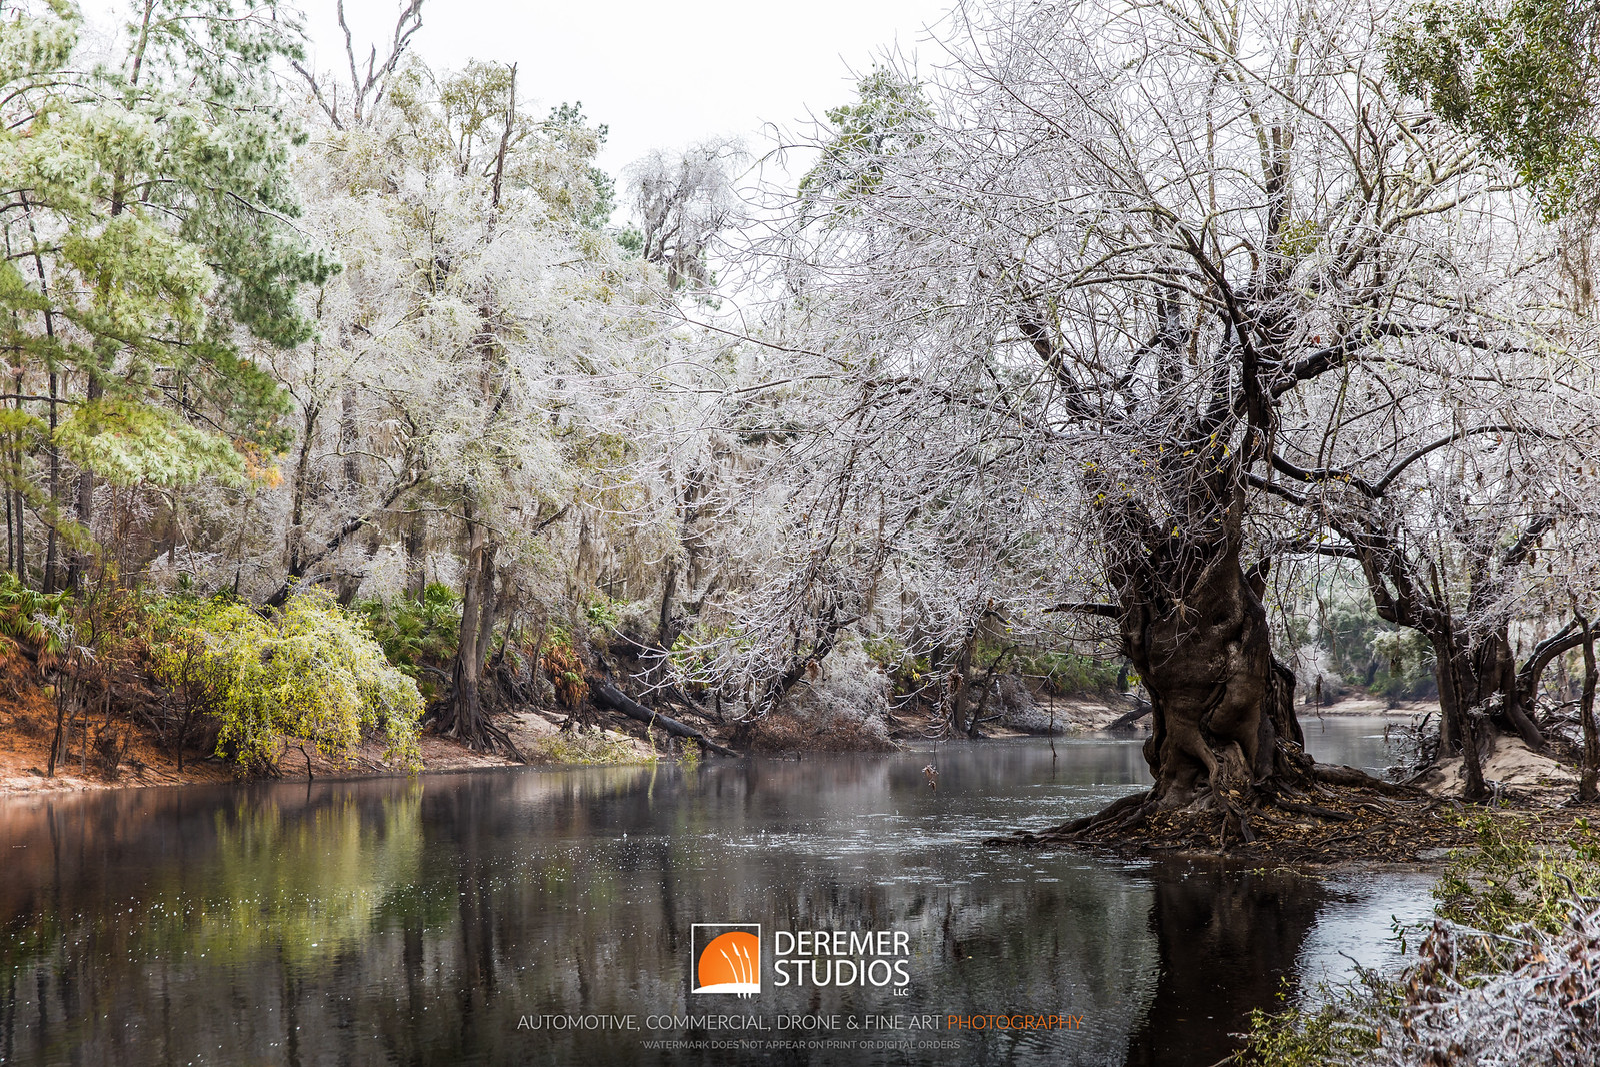 2018 Florida Icepocalypse Winter Storm 027A - Deremer Studios LLC